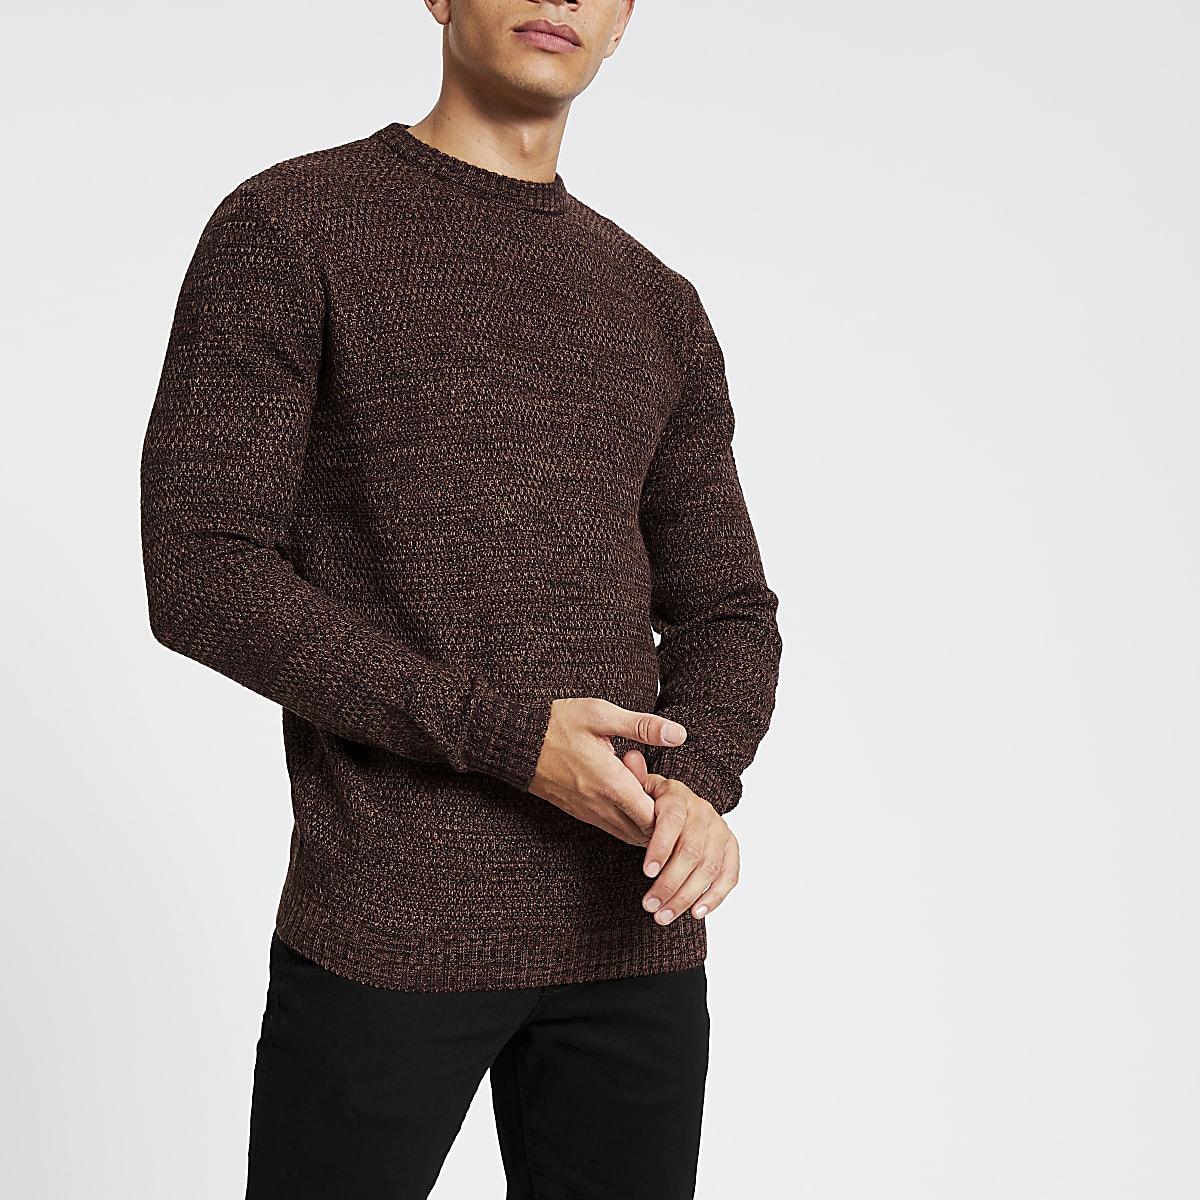 Bellfield brown textured knitted jumper